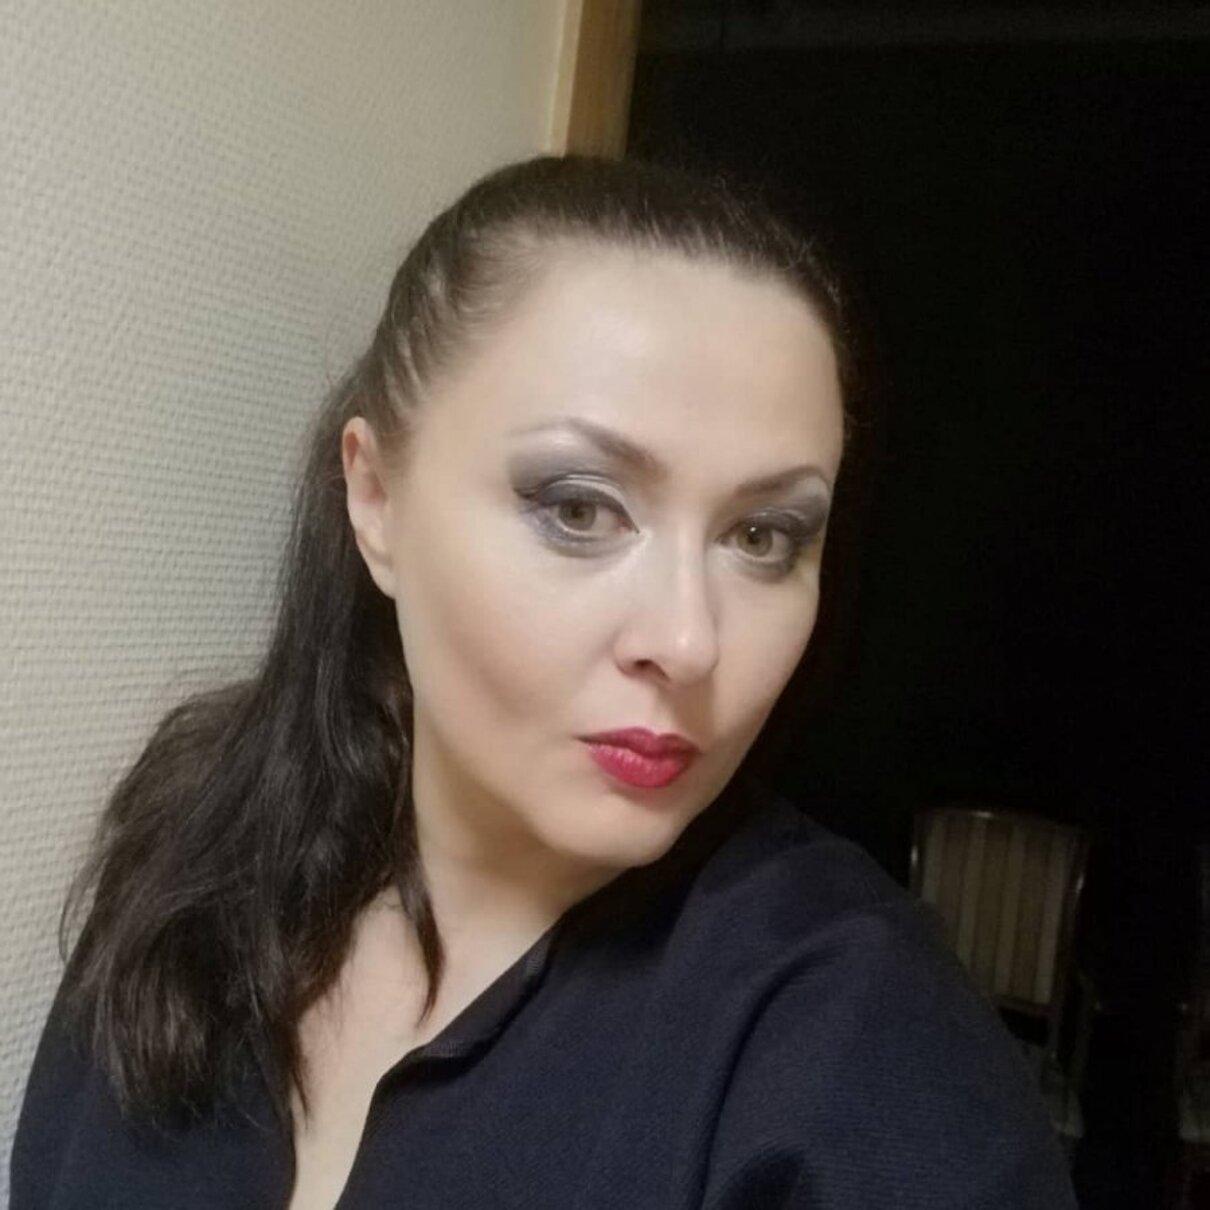 Жалоба-отзыв: Корчагина Анастасия Сергеевна - Корчагина Анастасия Сергеевна. Мошенница с недвижимостью - наводчица